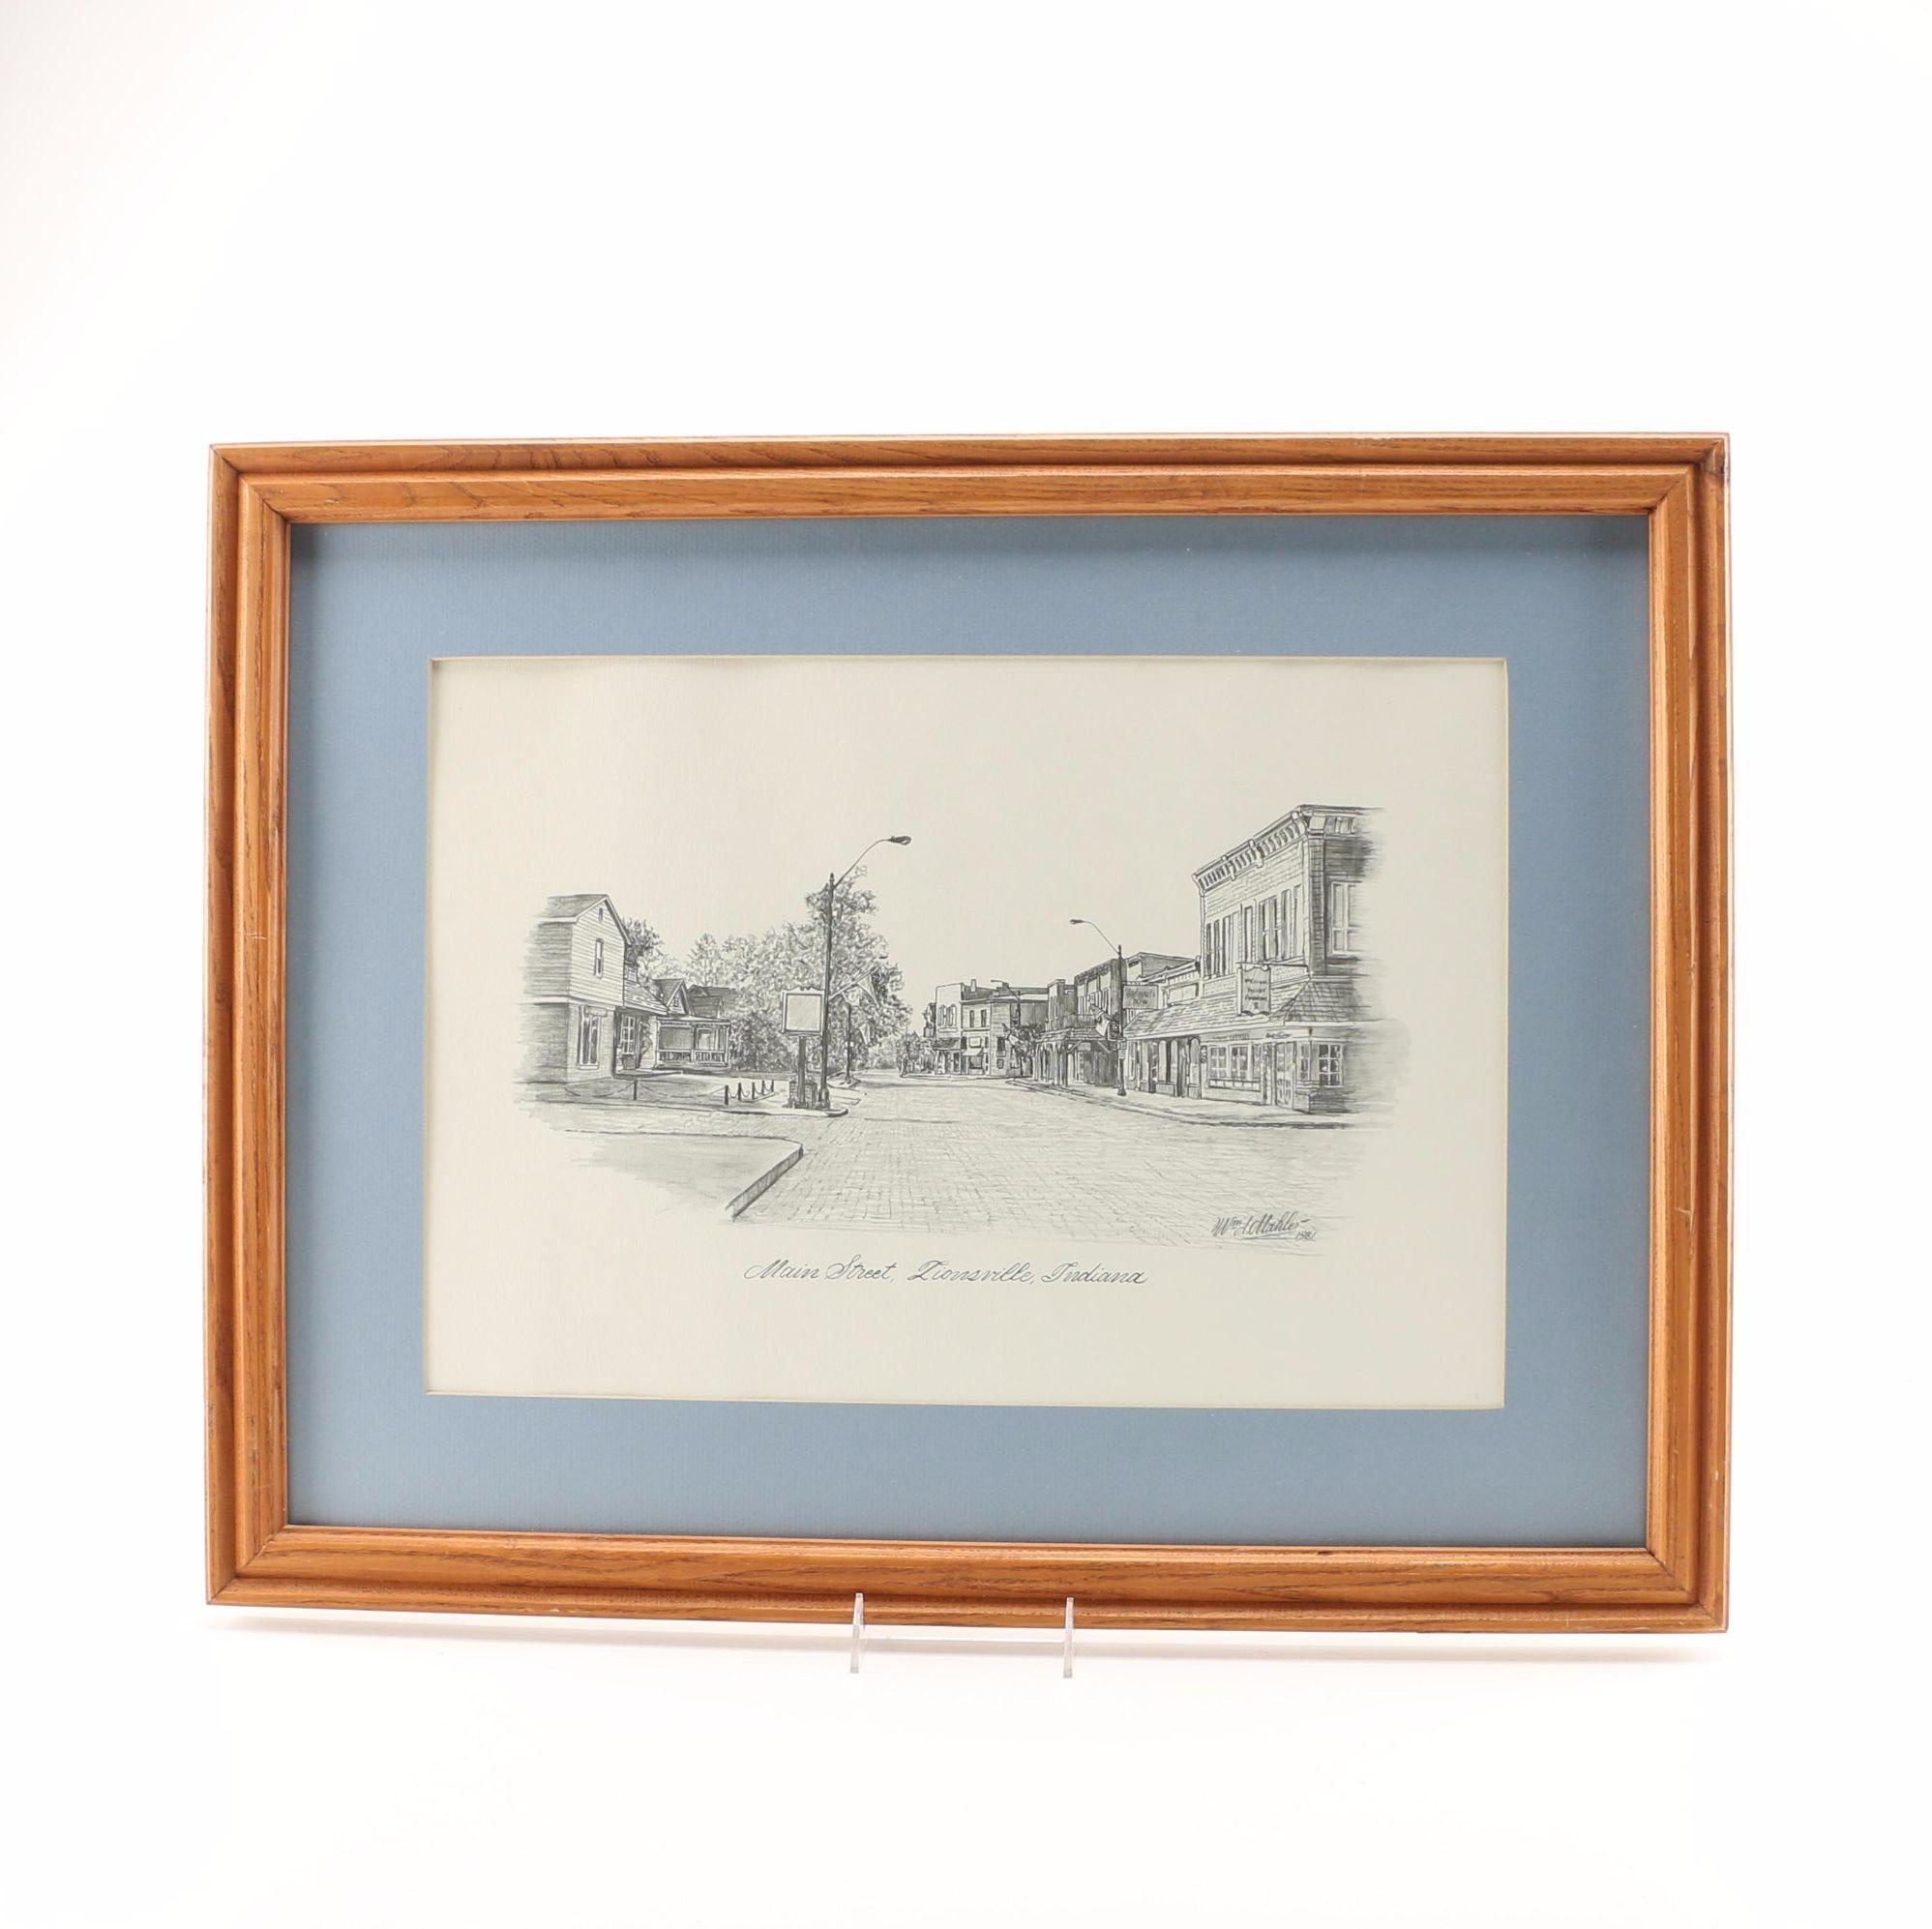 Framed Zionsville Indiana Print